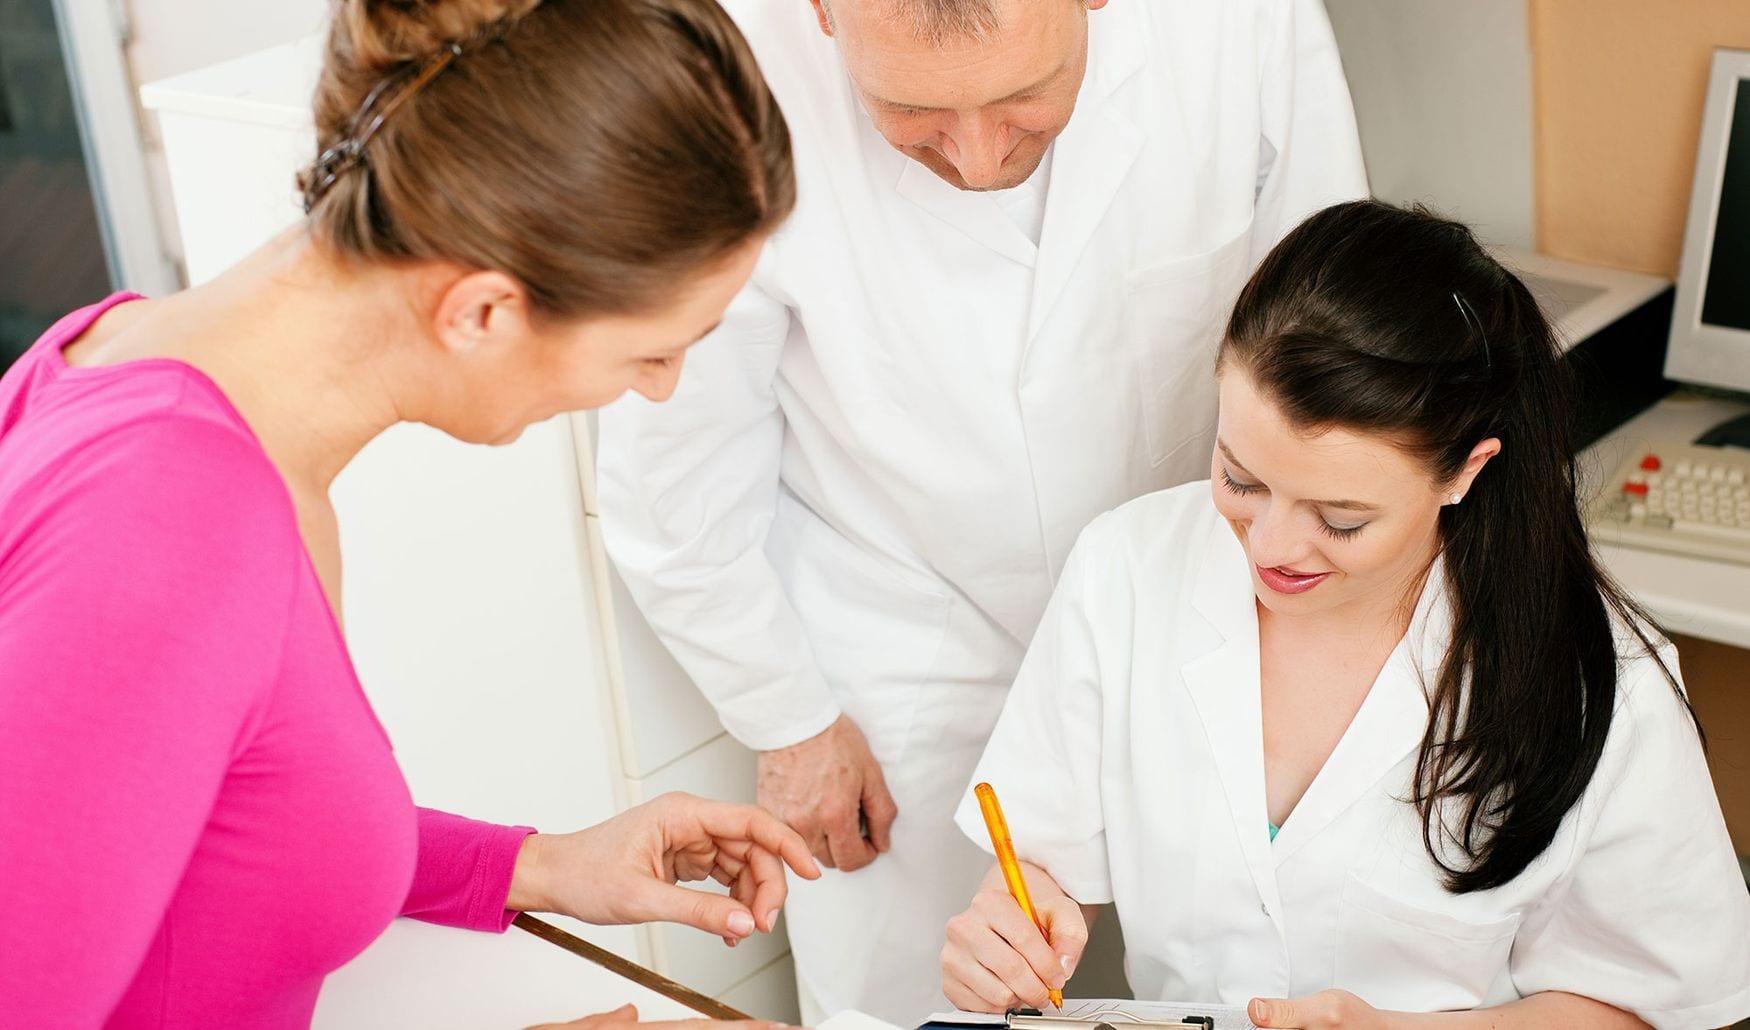 Laurus-College-Blog---Medical-Billing-&-Coding-ICD-10